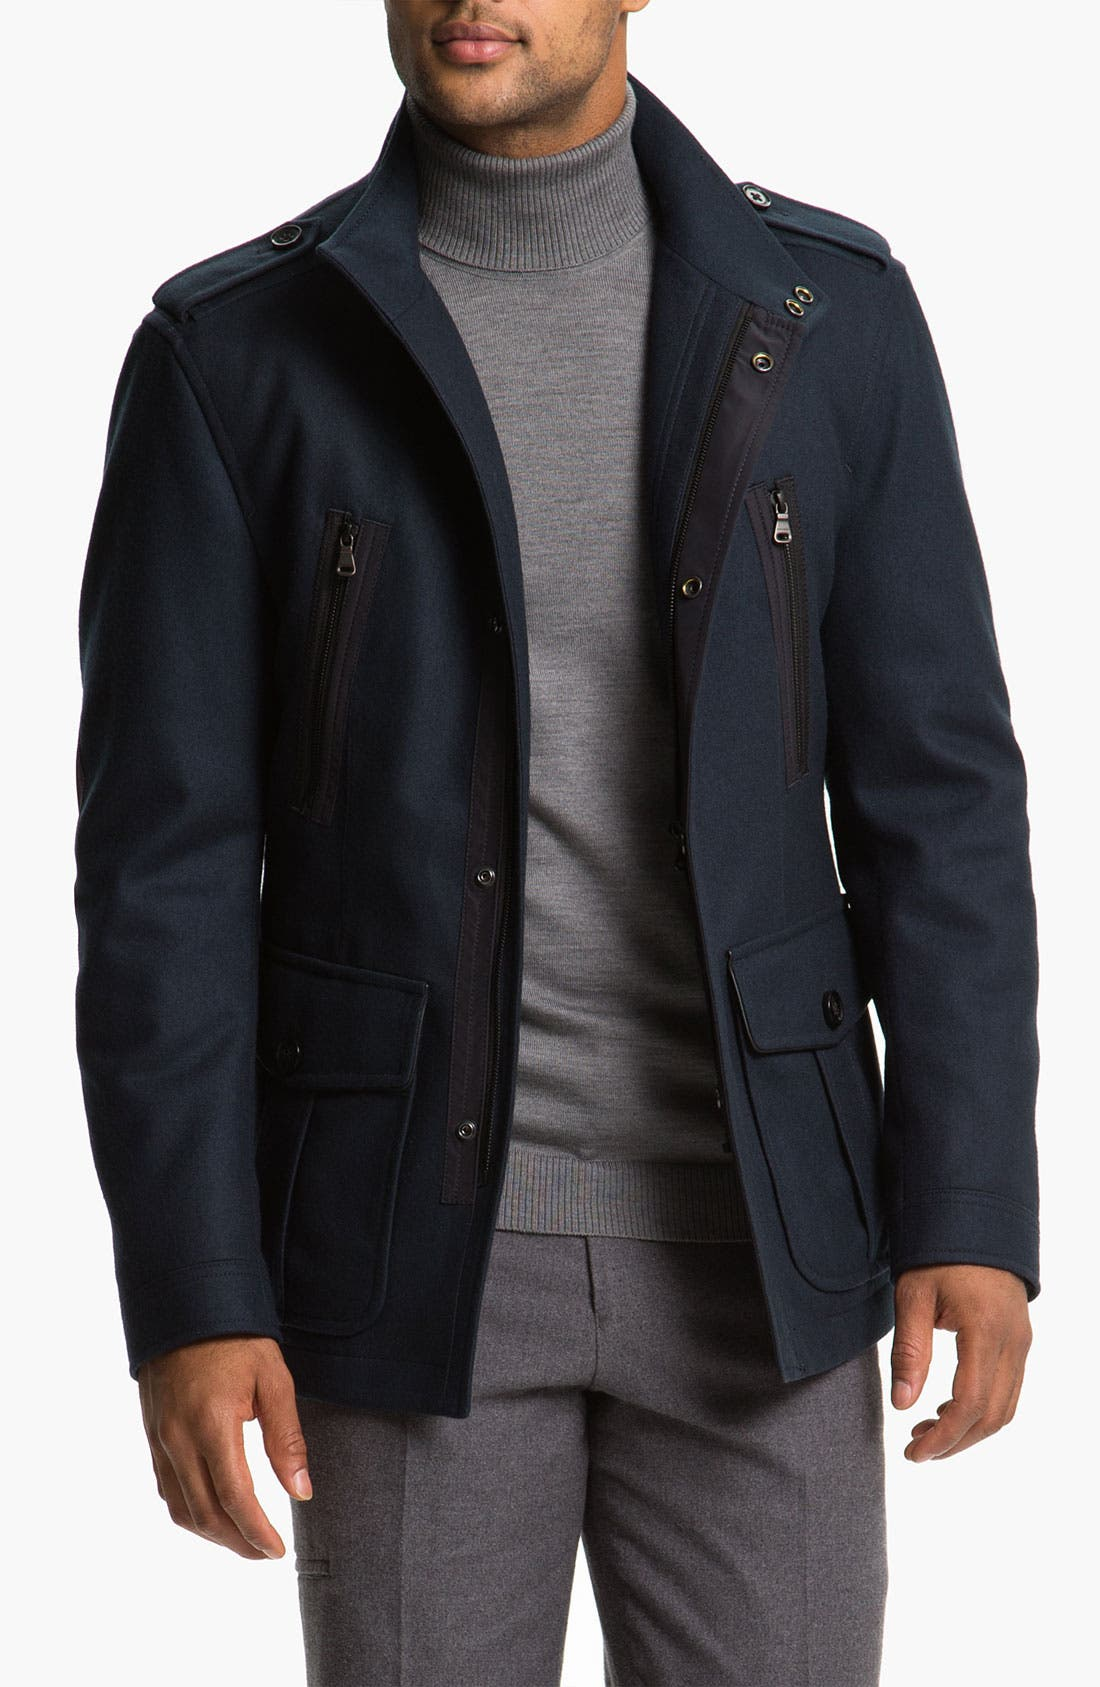 Alternate Image 1 Selected - BOSS Black 'Ciffom' Wool Jacket